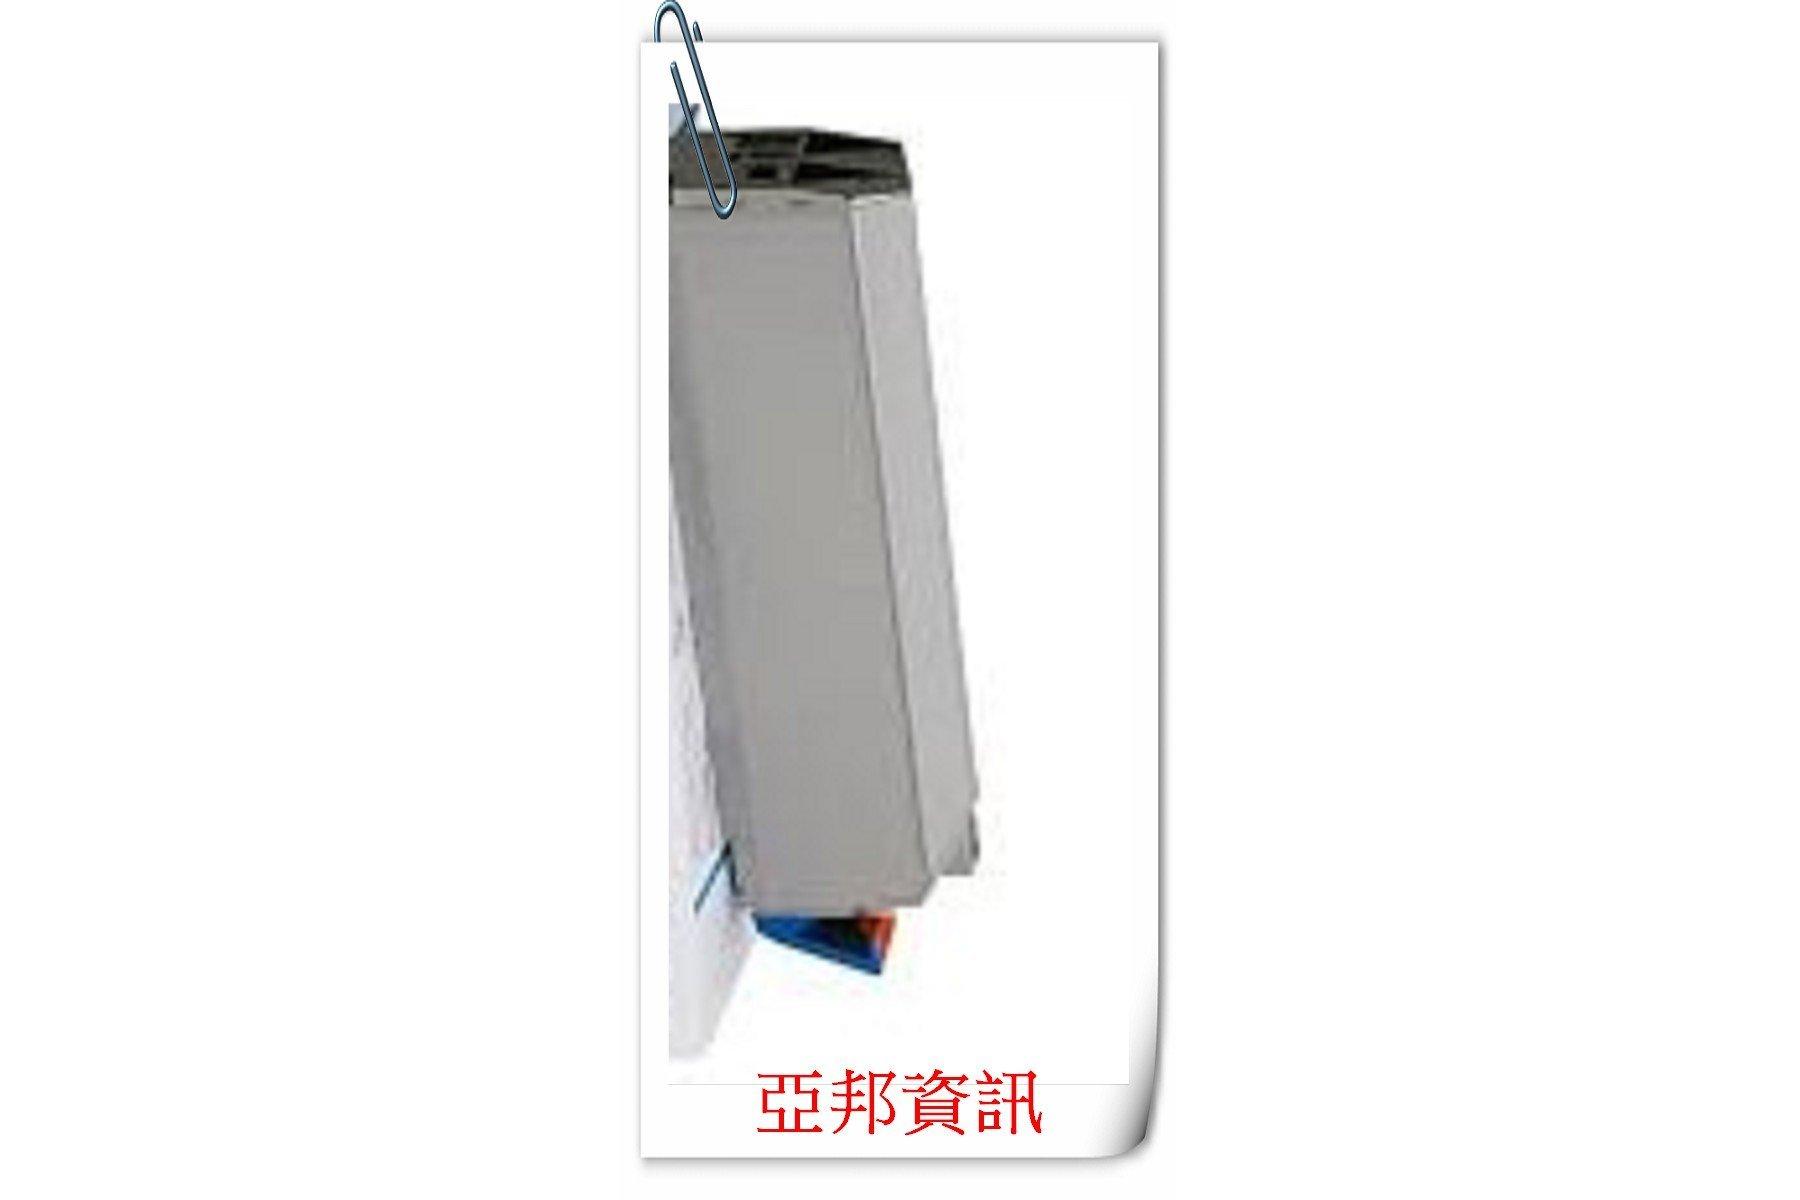 OKI 副廠碳粉匣 41963682 黑 適應 C9300/C9500/9300/9500 亞邦資訊